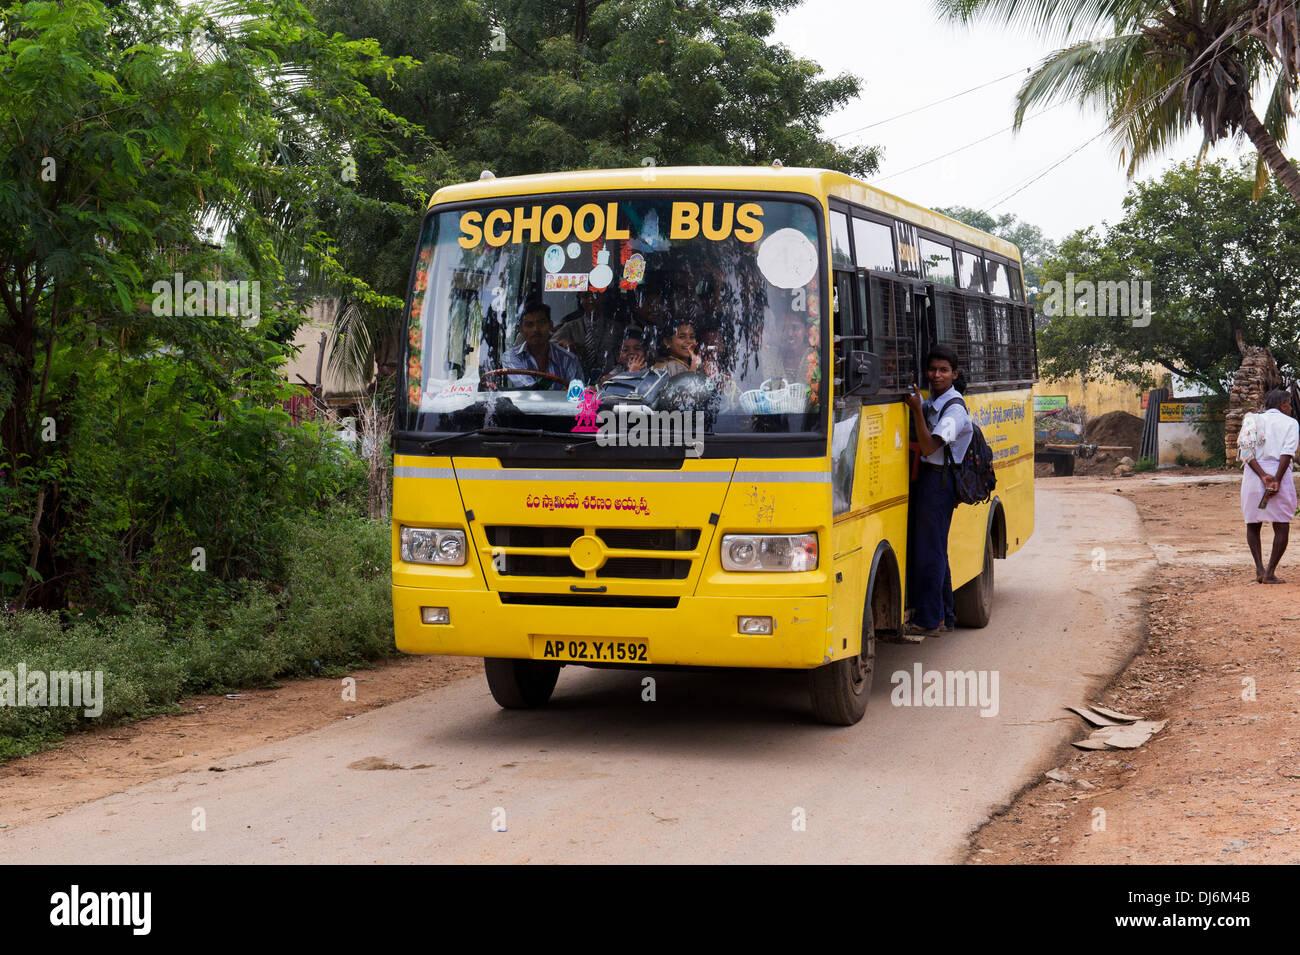 Indian School Buses Stock Photos Indian School Buses Stock